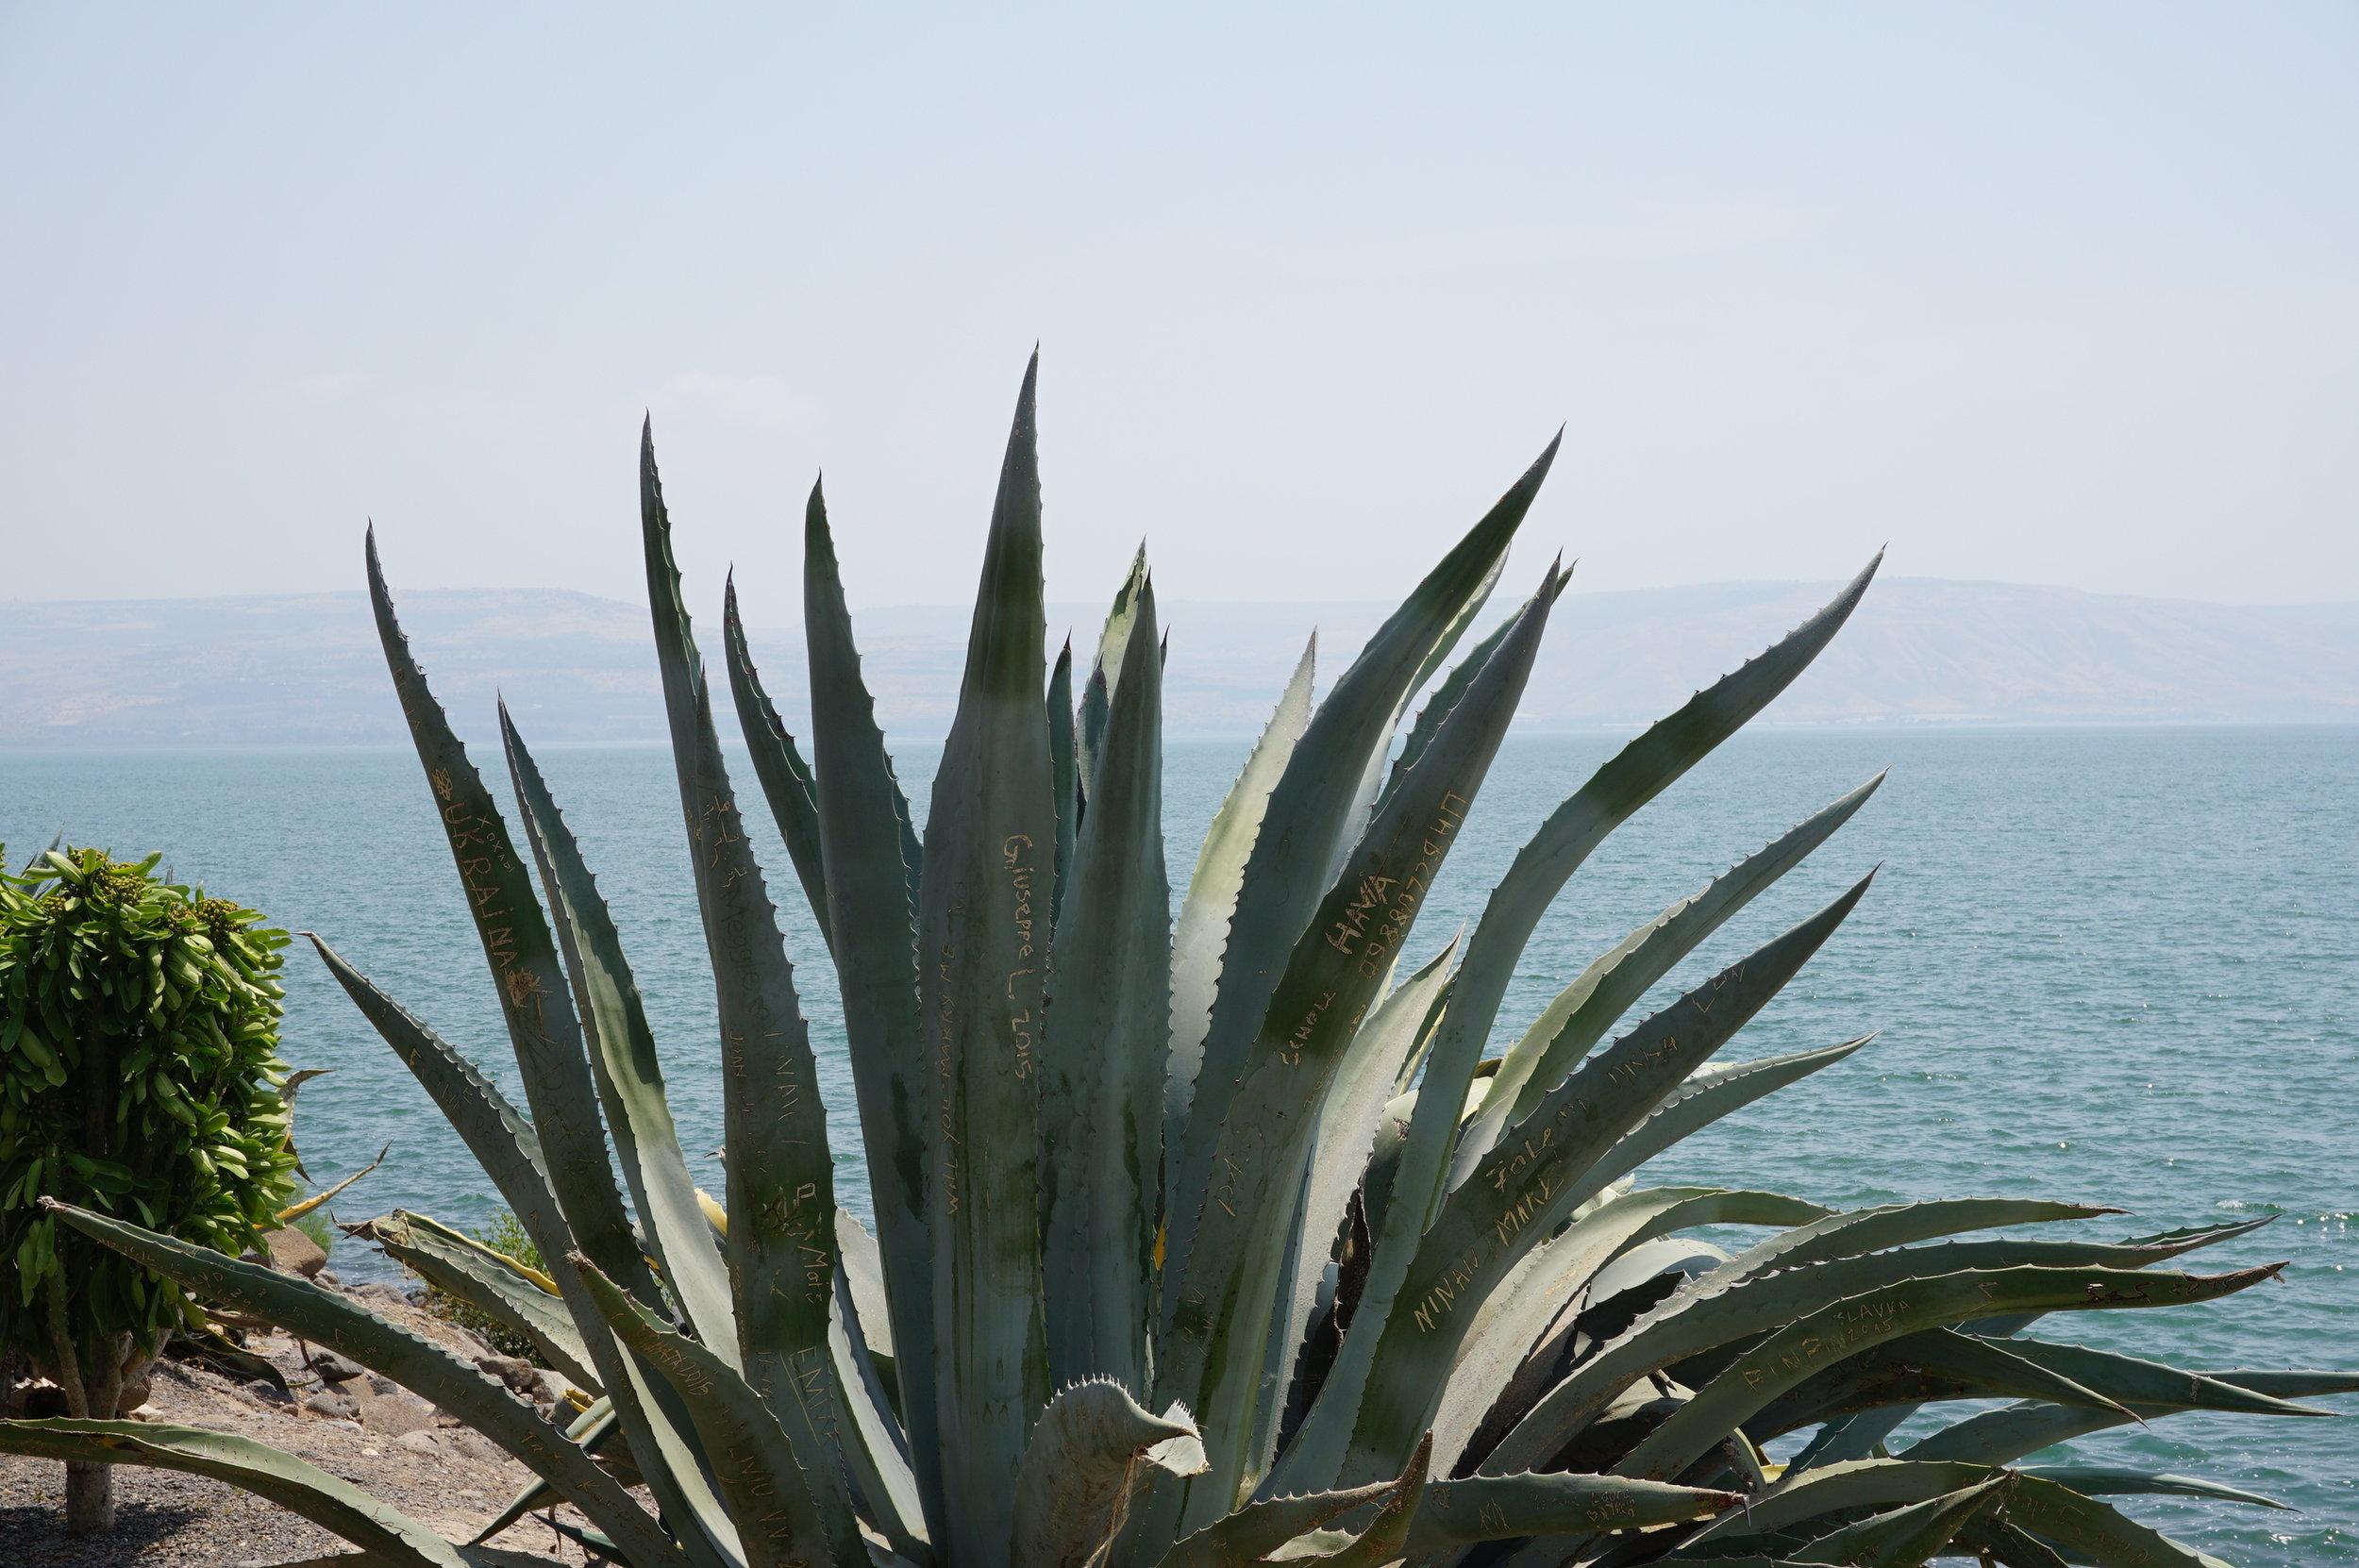 Capernaum & the Sea of Galilee